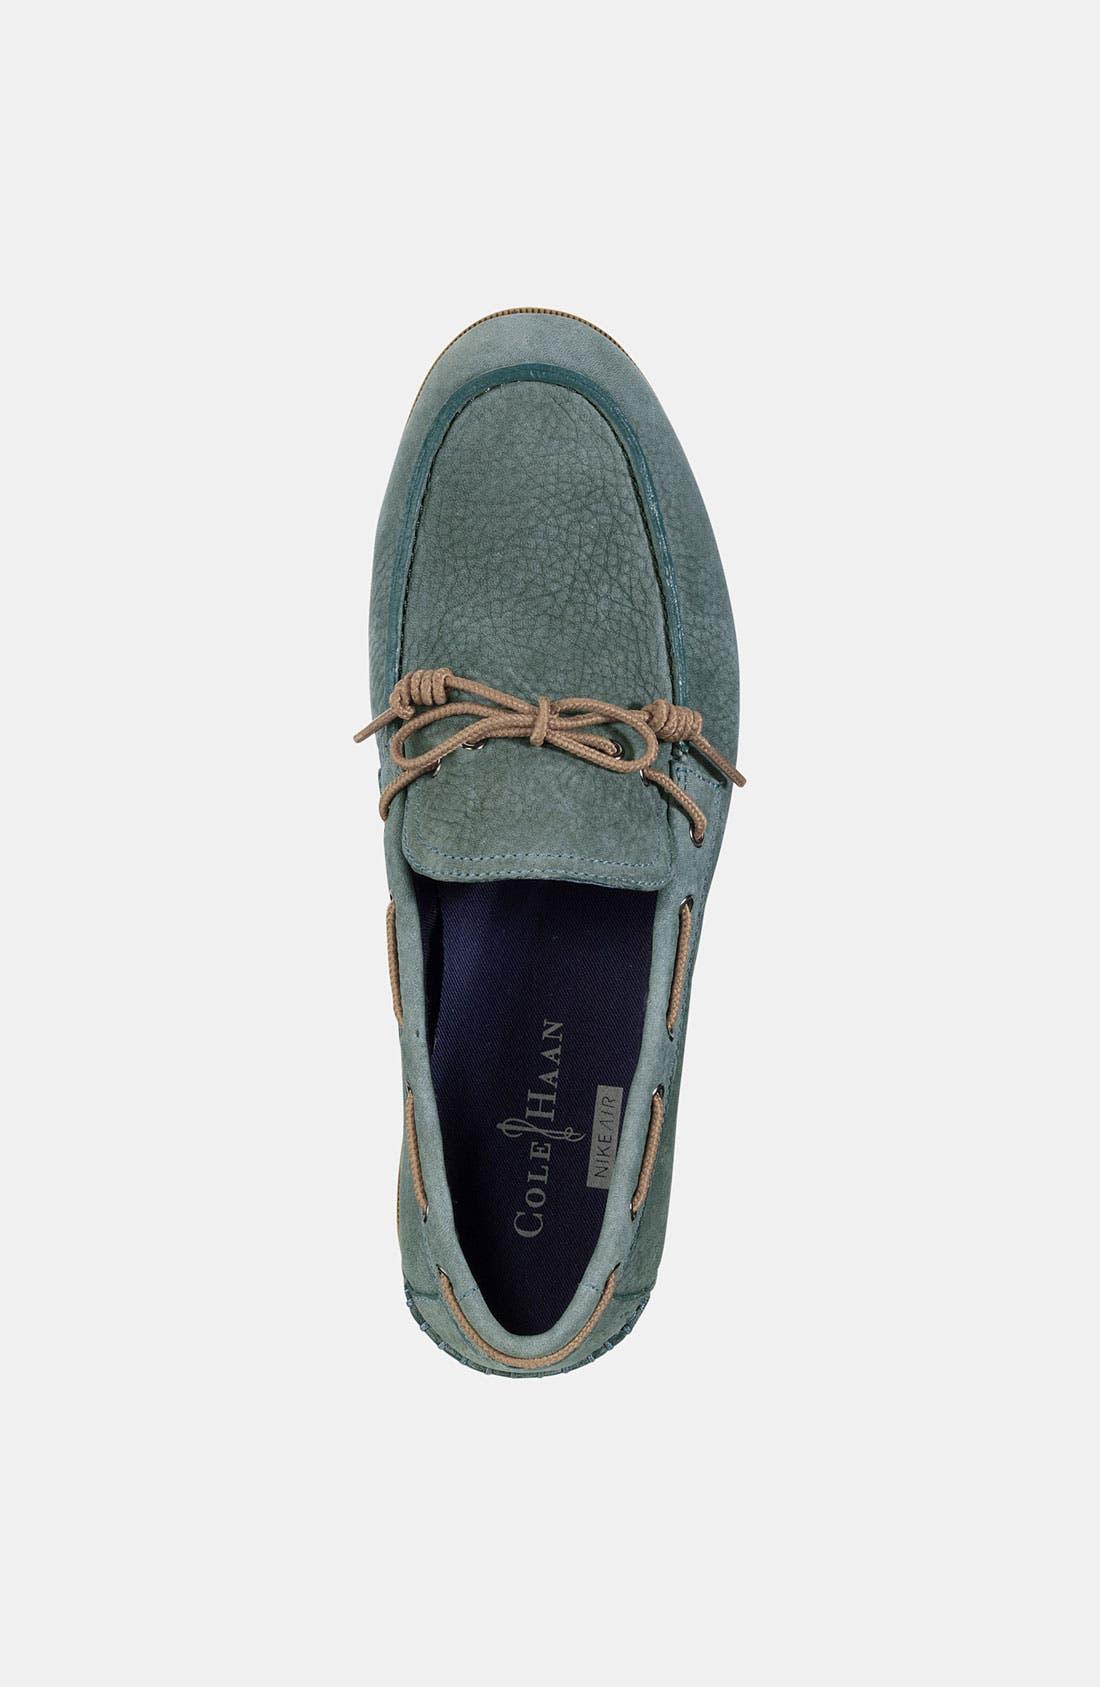 Alternate Image 3  - Cole Haan 'Air Mason' Boat Shoe   (Men)